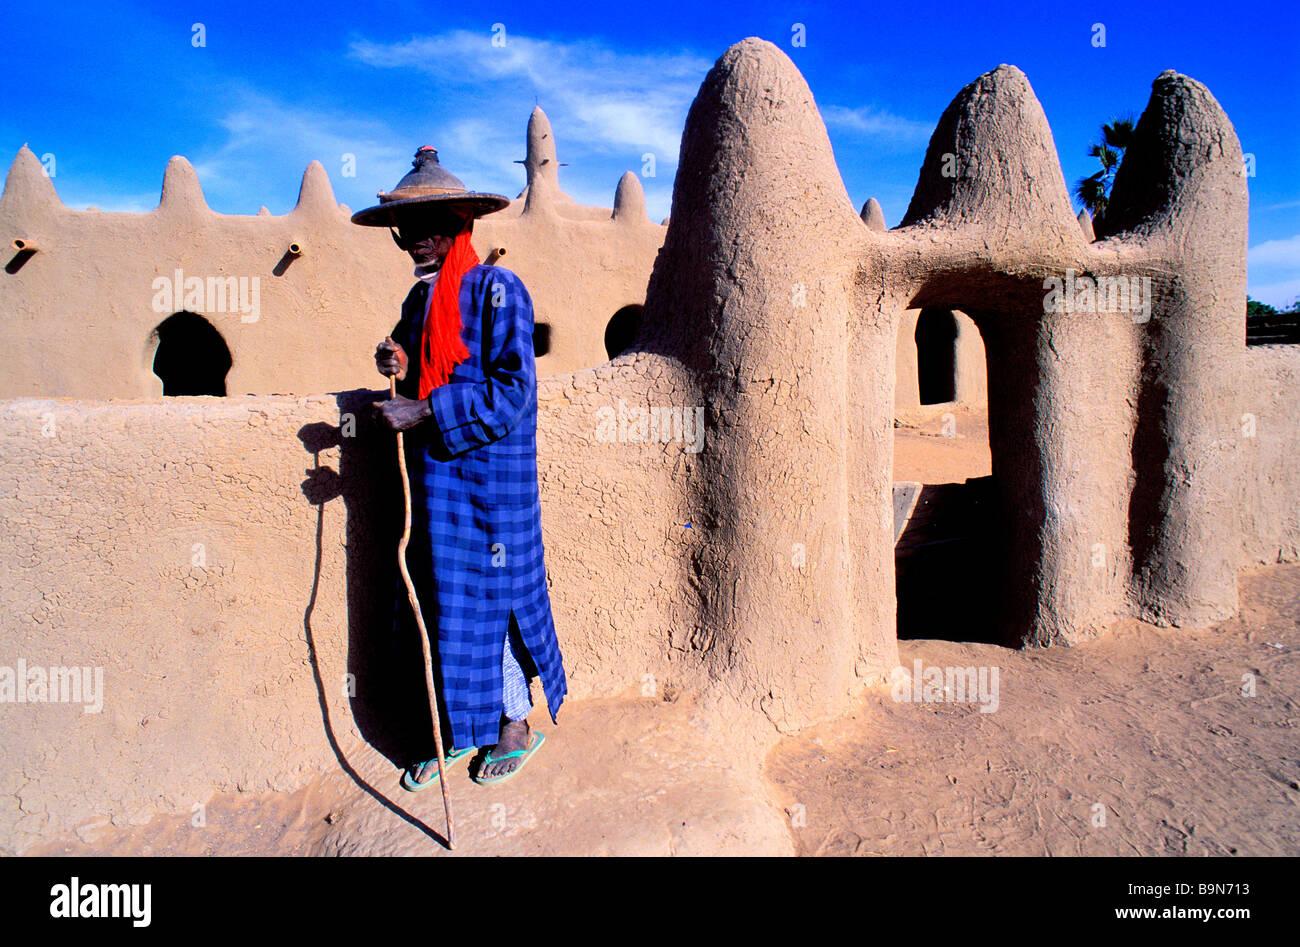 Malí, cerca de la región de Mopti, Djenne, Senossa aldea fula, hombre Foto de stock